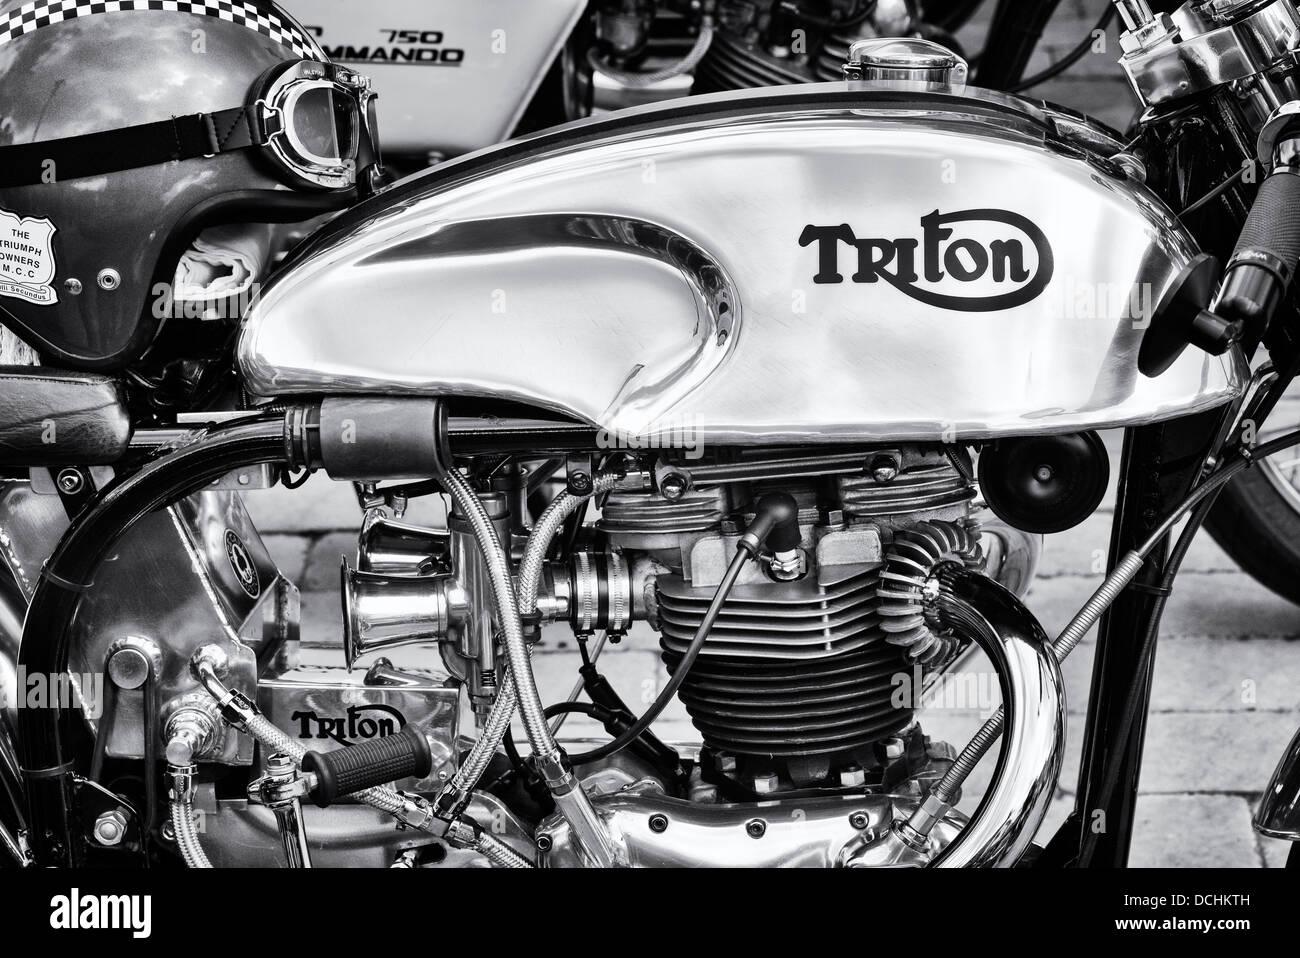 Triton Café racer motorcycle. Triumph/Norton motorbike. Classic British motorcycle. Monochrome - Stock Image